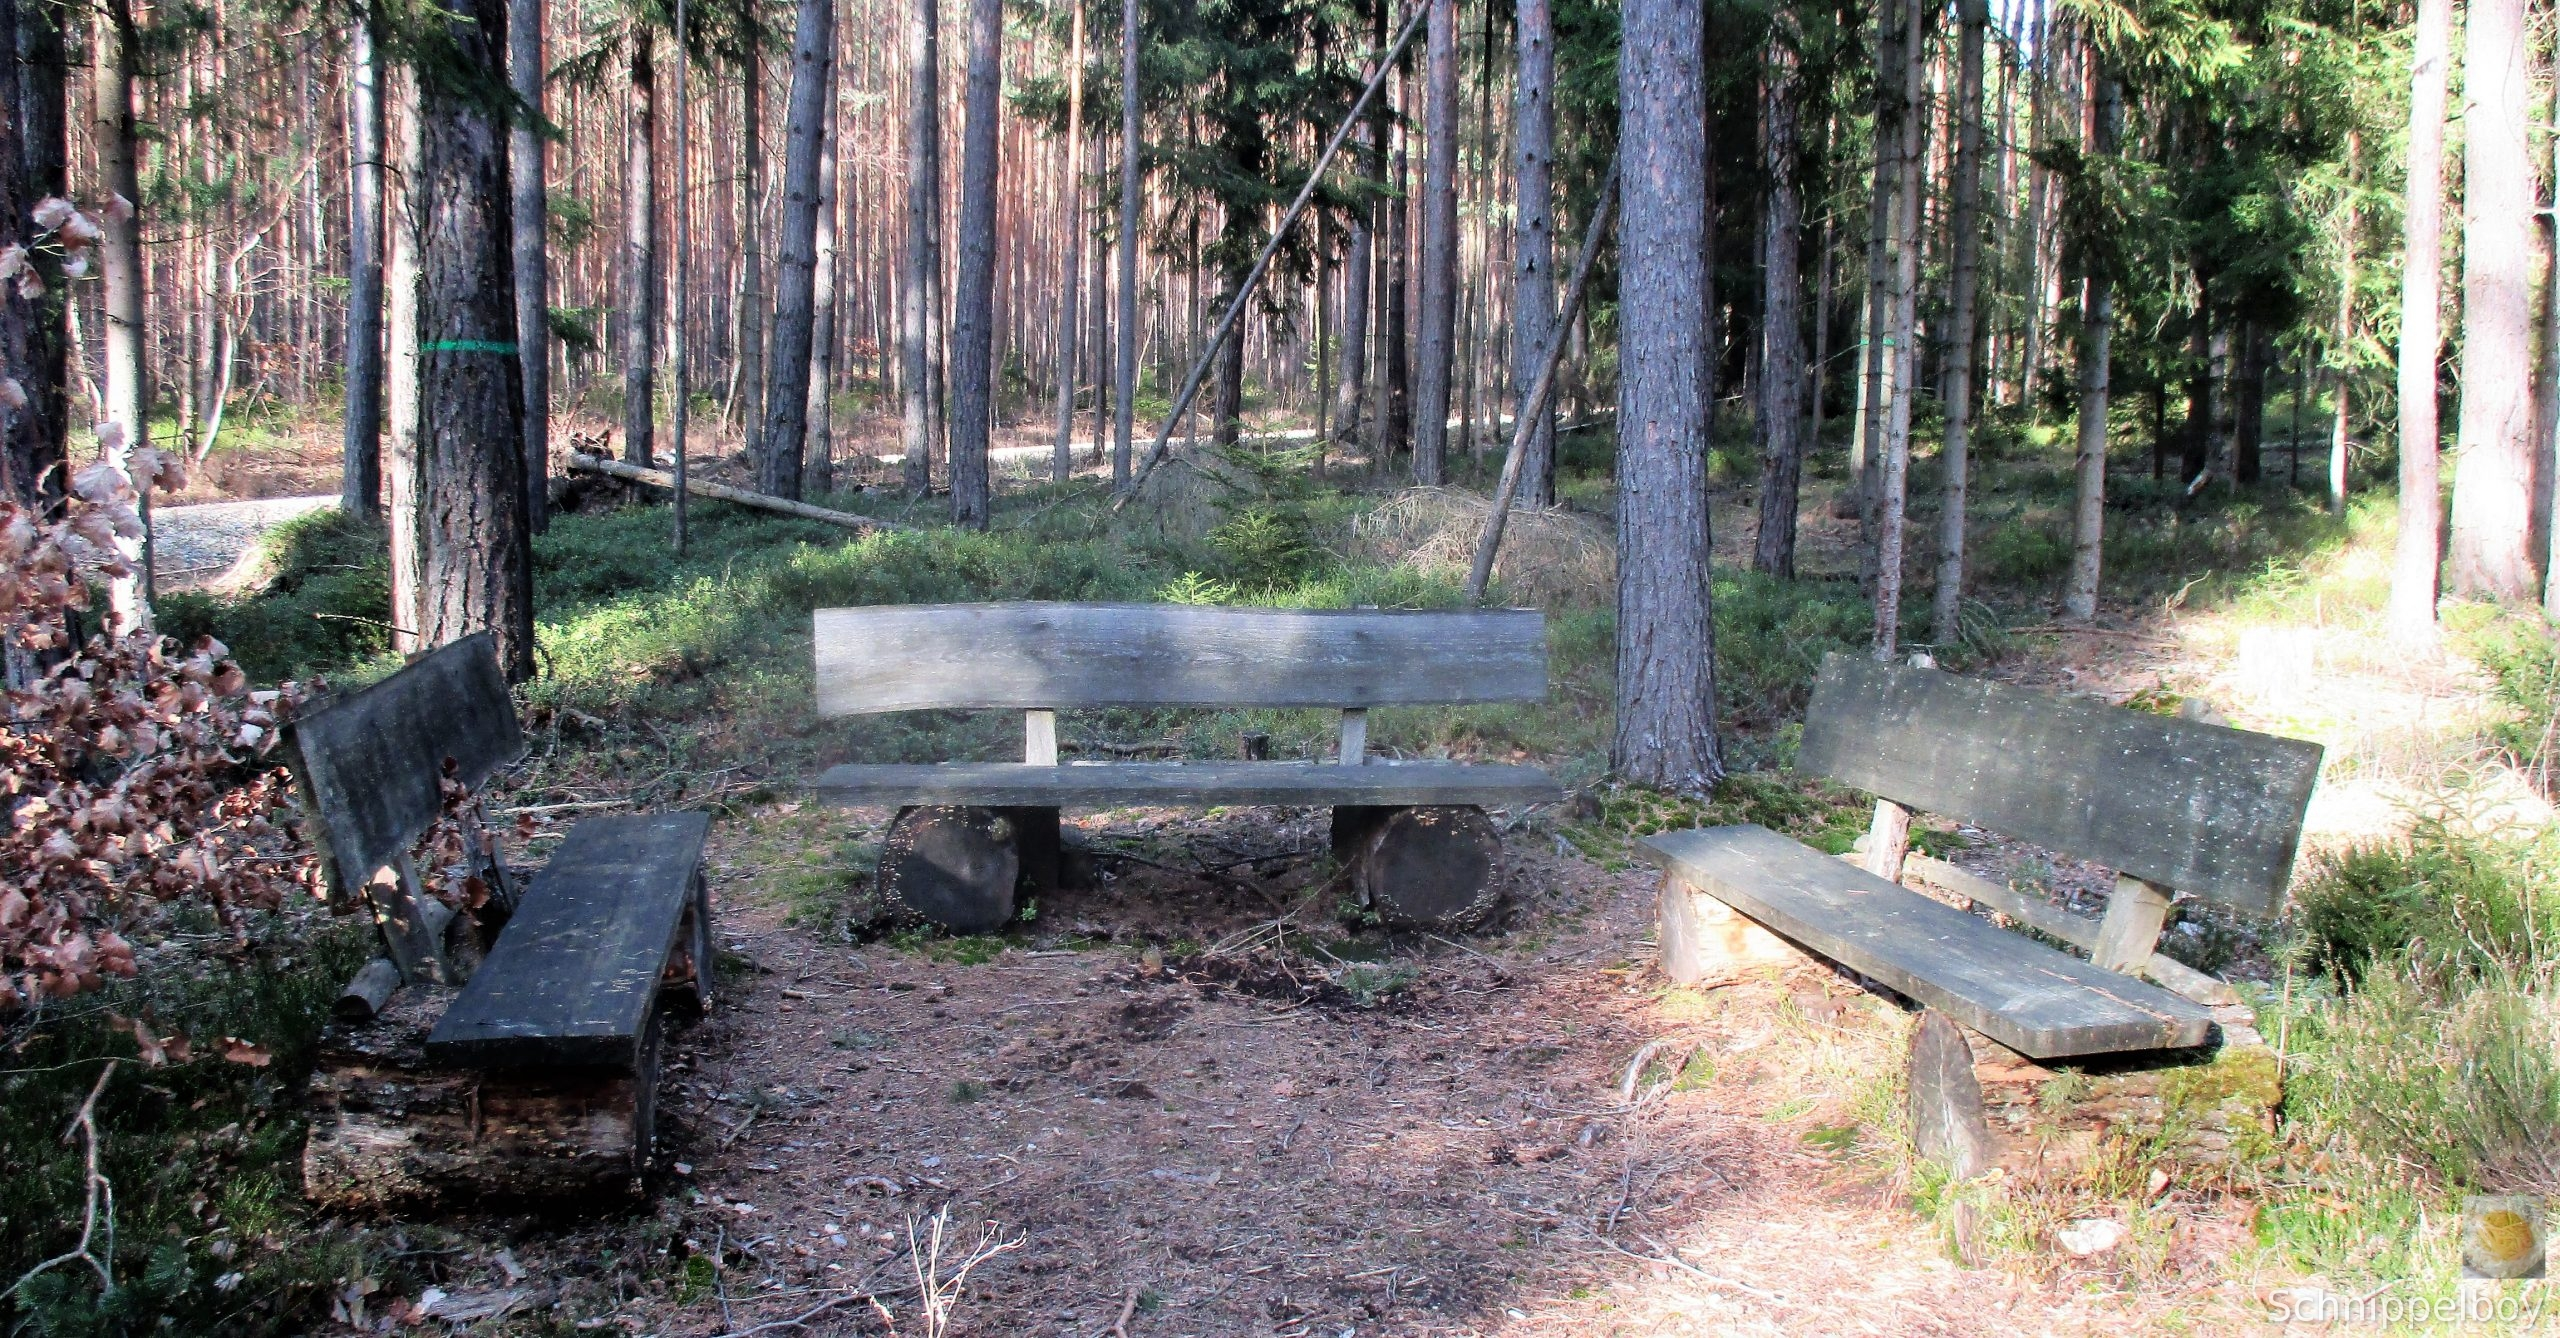 19.03.20 Wald Blankenhain. 1 (2)